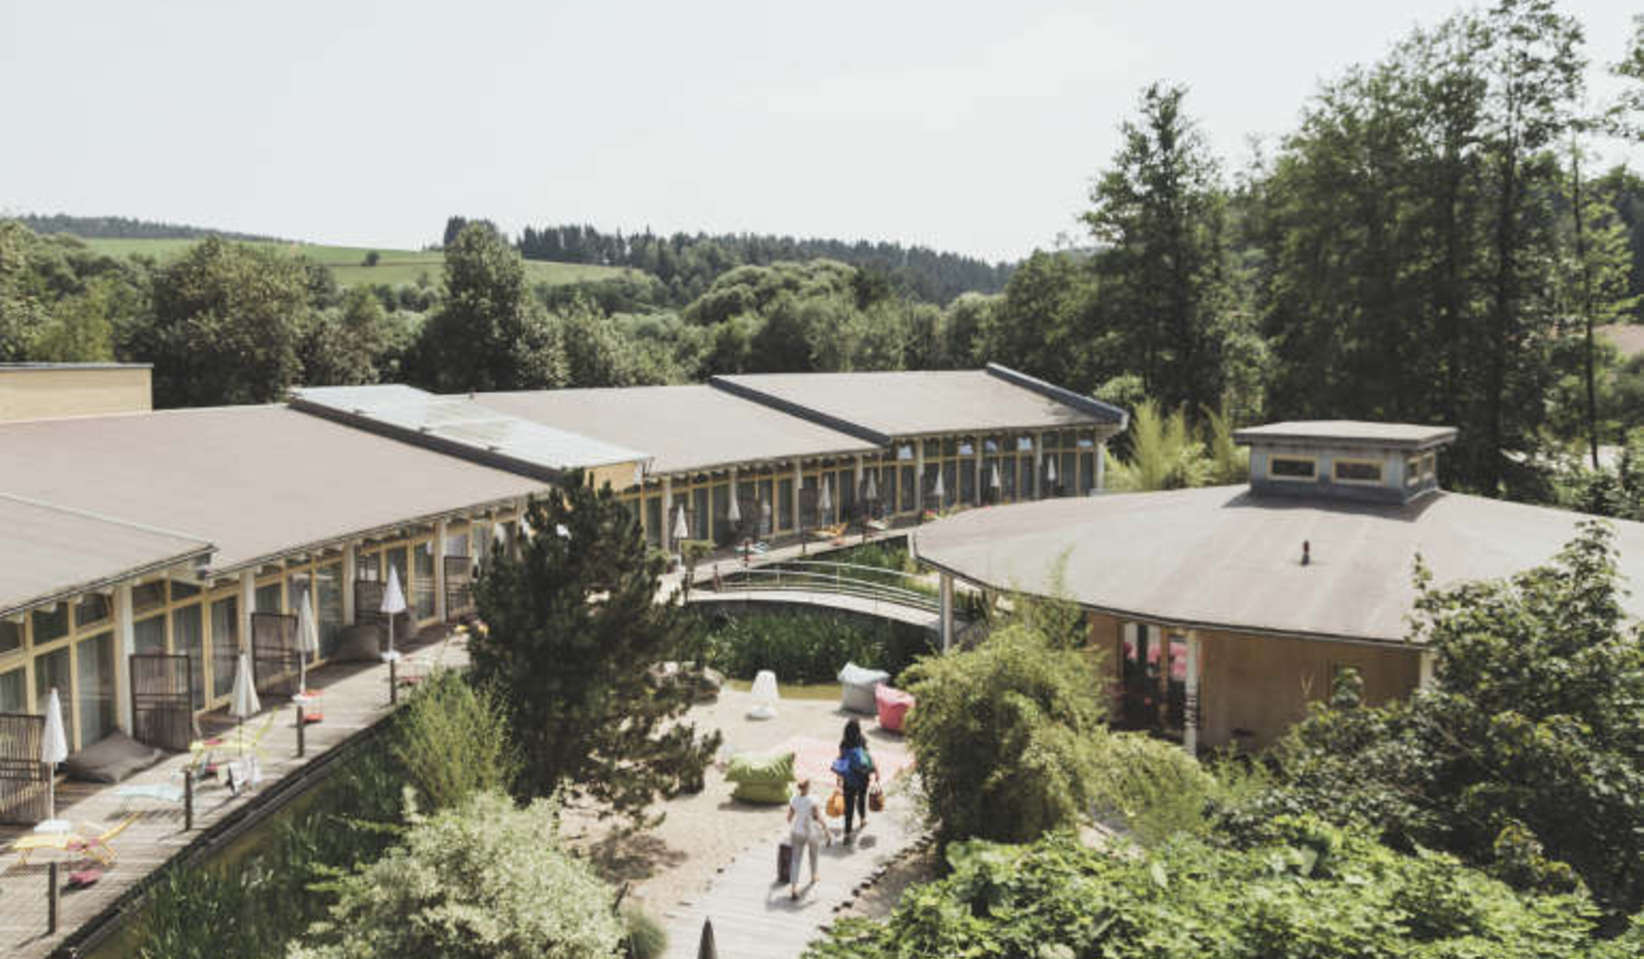 Adventure Camp Schnitzmühle